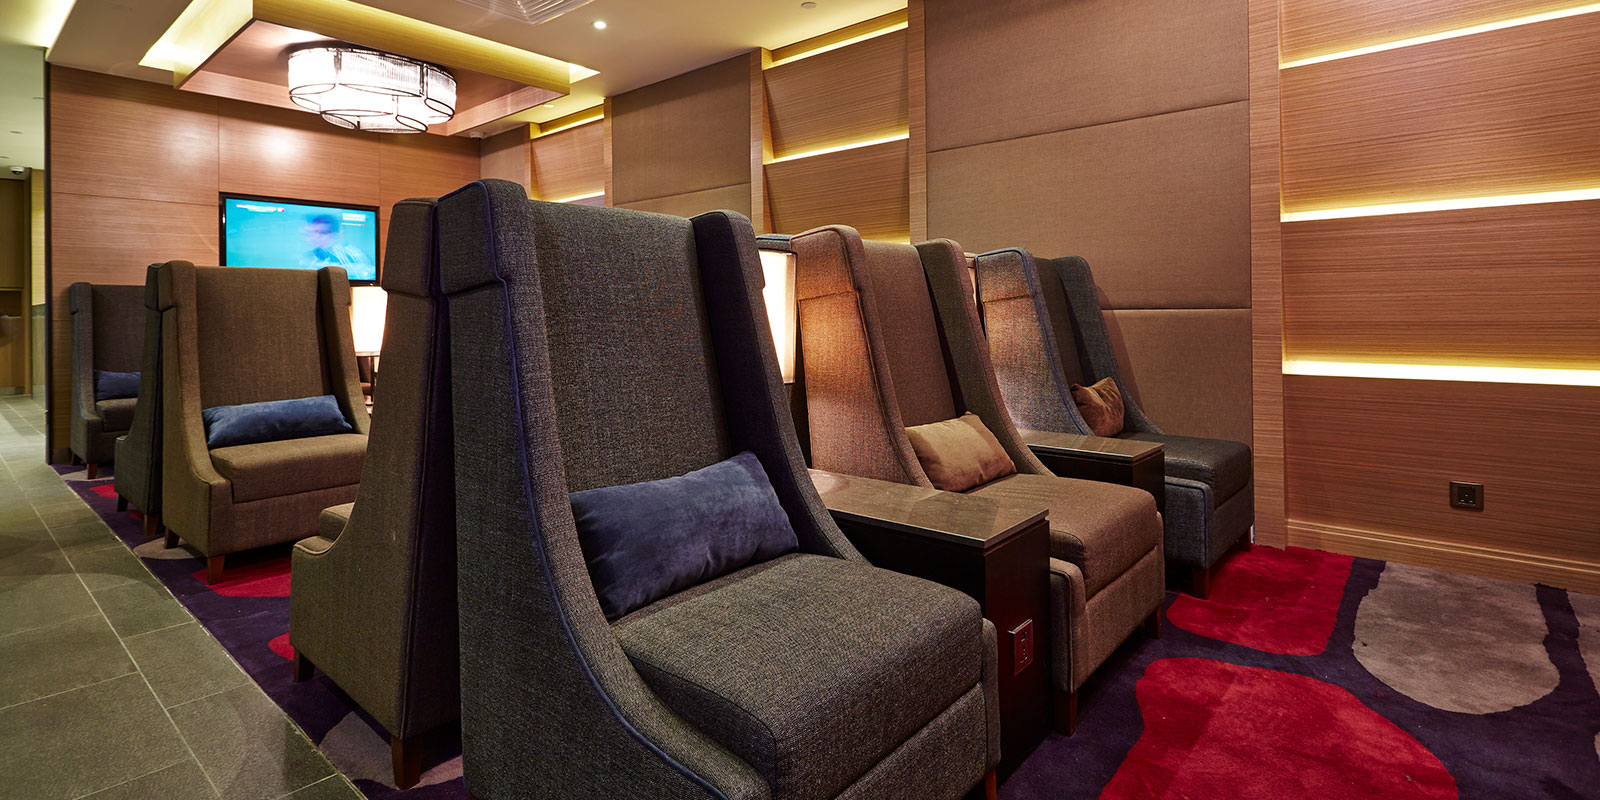 Plaza Premium Lounge Plaza Premium Lounge International Departures Terminal Klia2